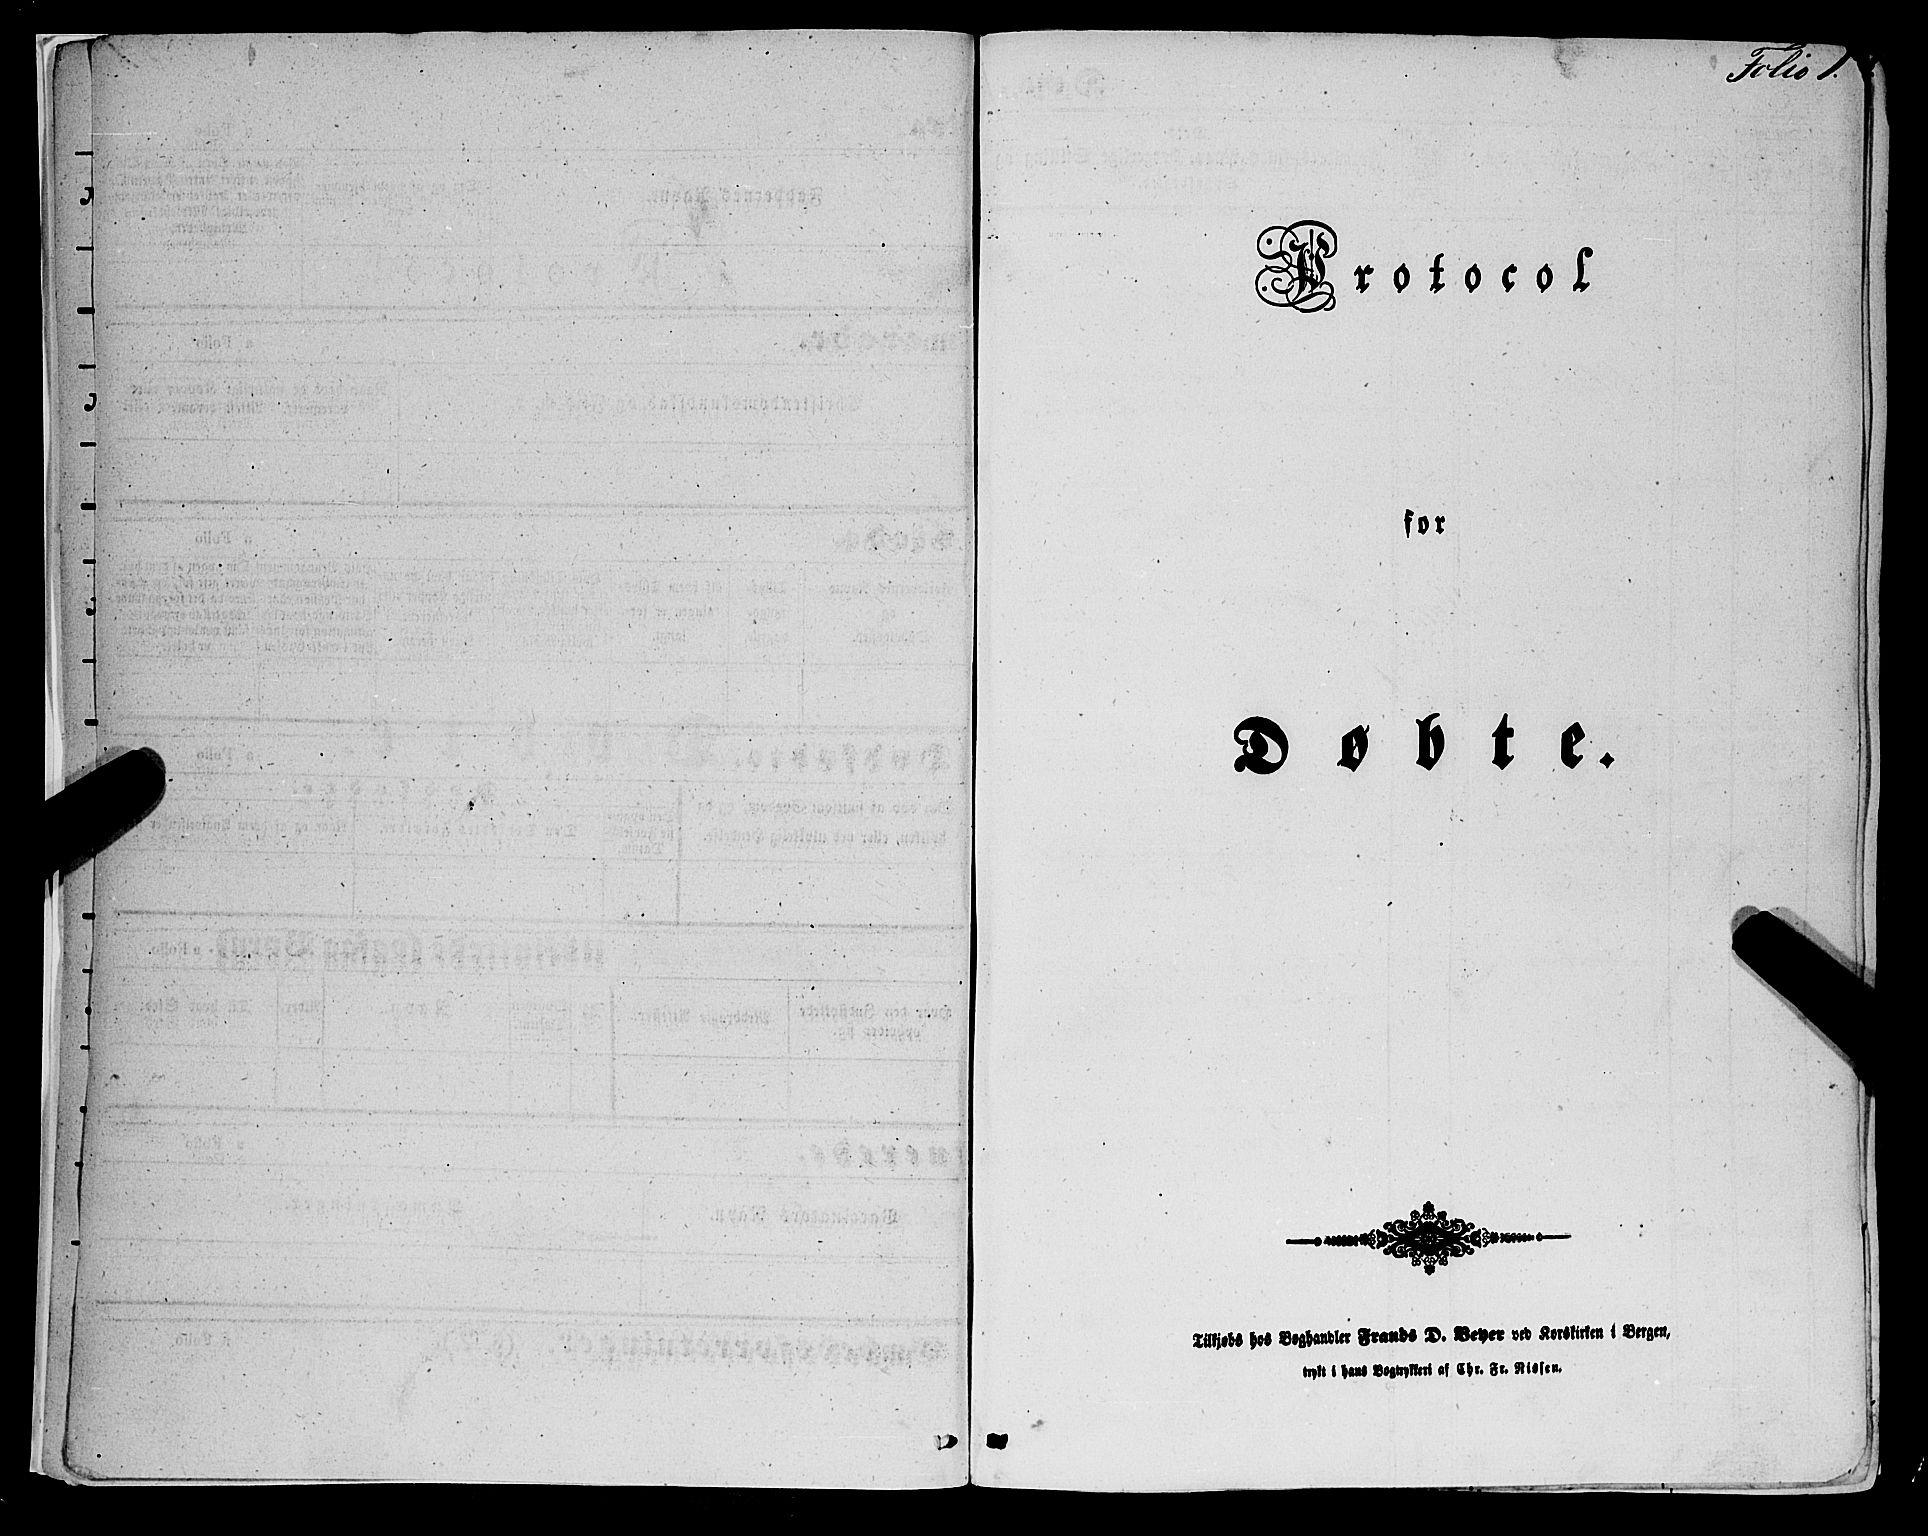 SAB, Sogndal Sokneprestembete, H/Haa/Haaa/L0012I: Ministerialbok nr. A 12I, 1847-1859, s. 1